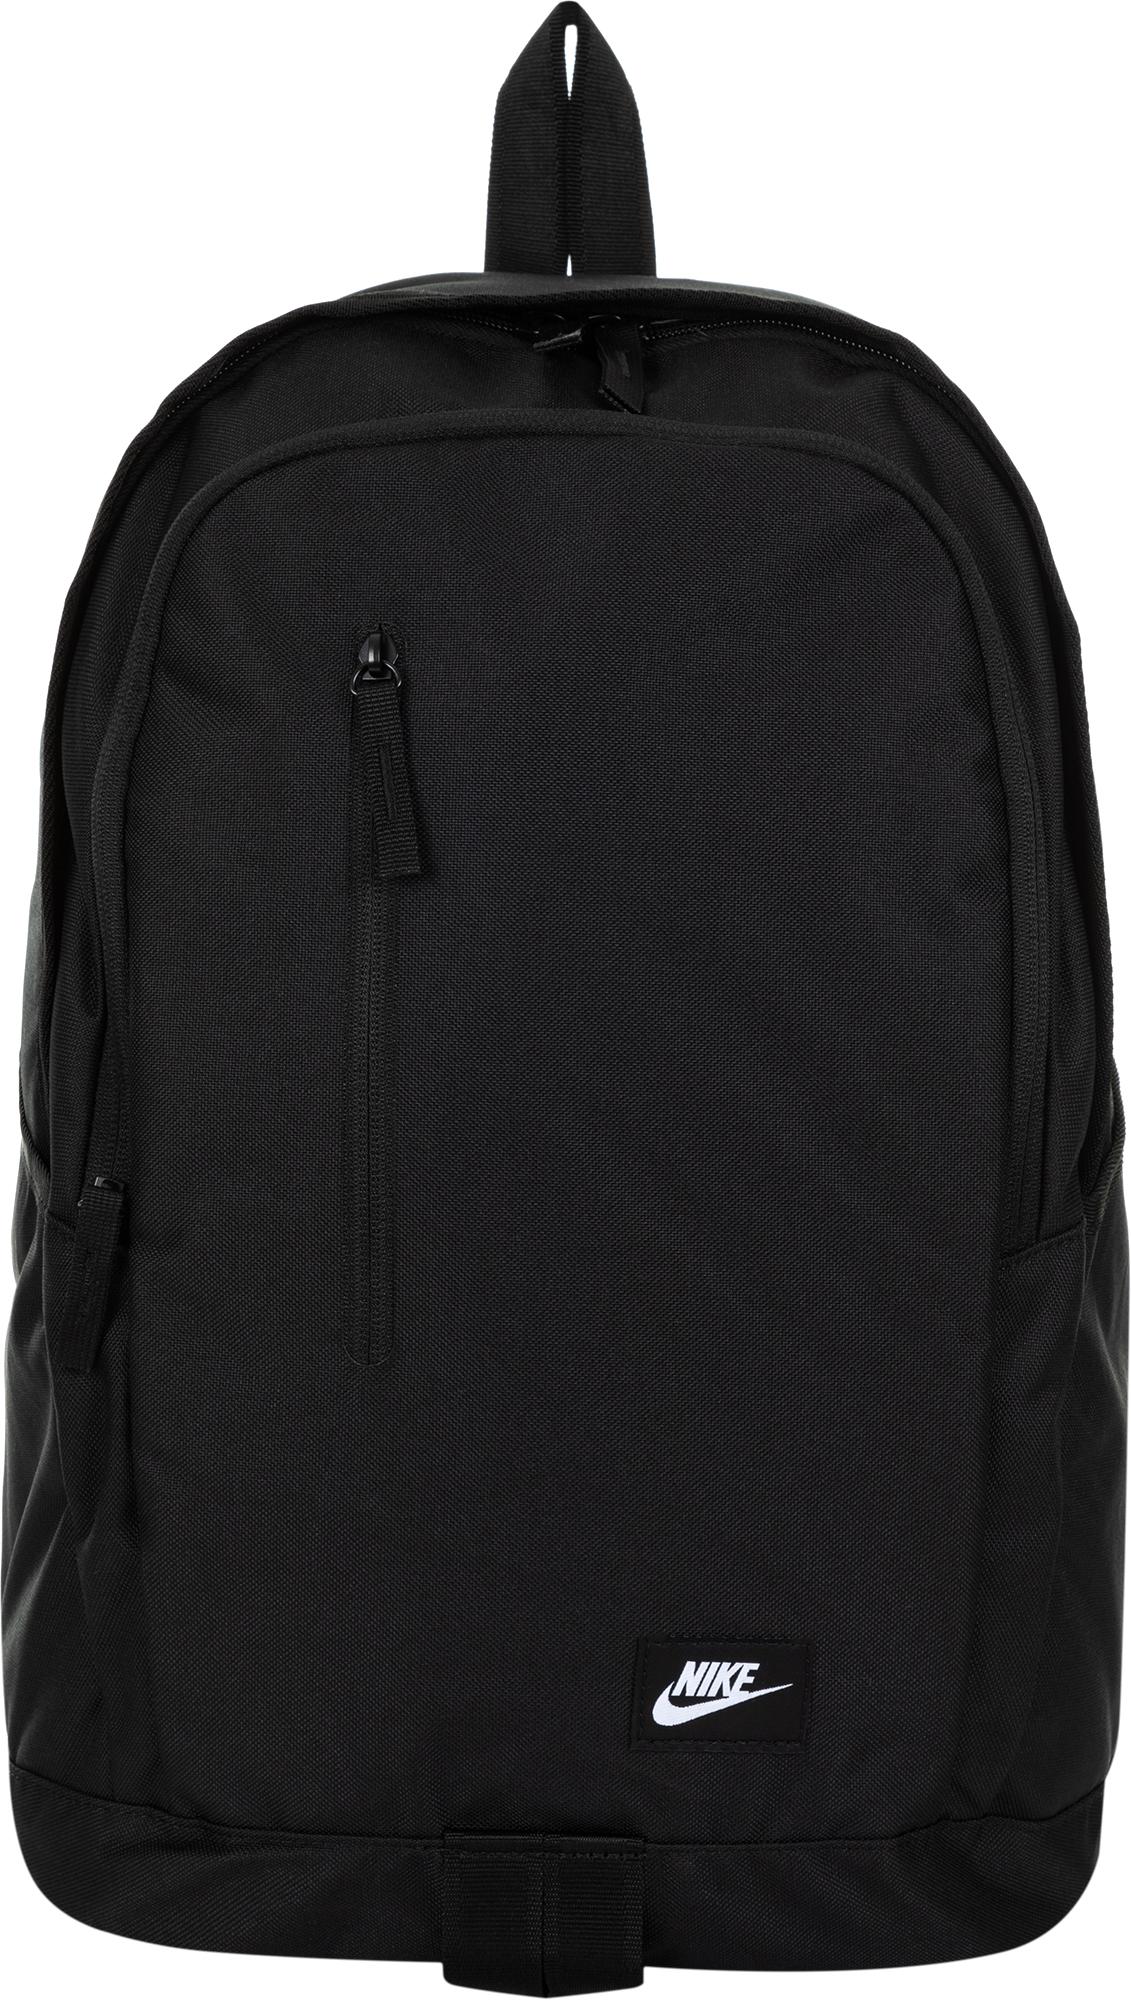 Nike Рюкзак Nike All Access Soleday, размер Без размера лавинный рюкзак bca backcountry access bca squall оранжевый